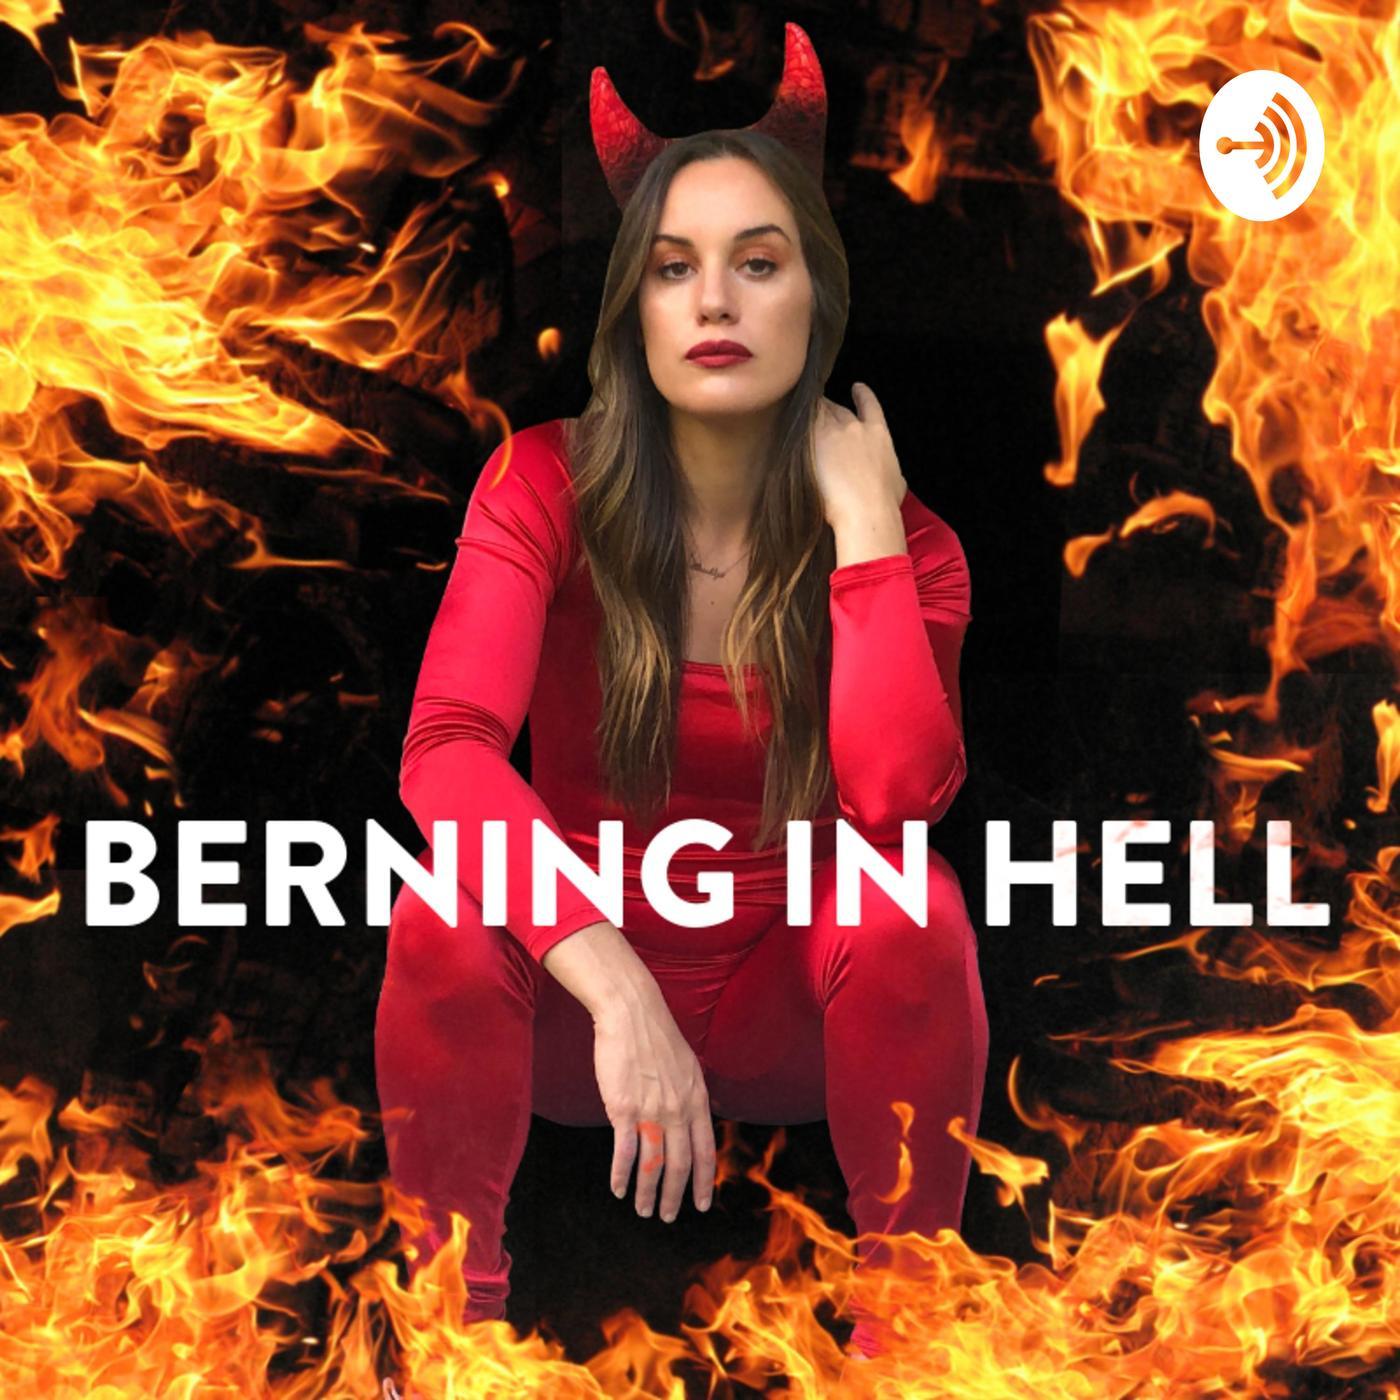 Ellie Schnitt Haters Hilariousness Berning In Hell